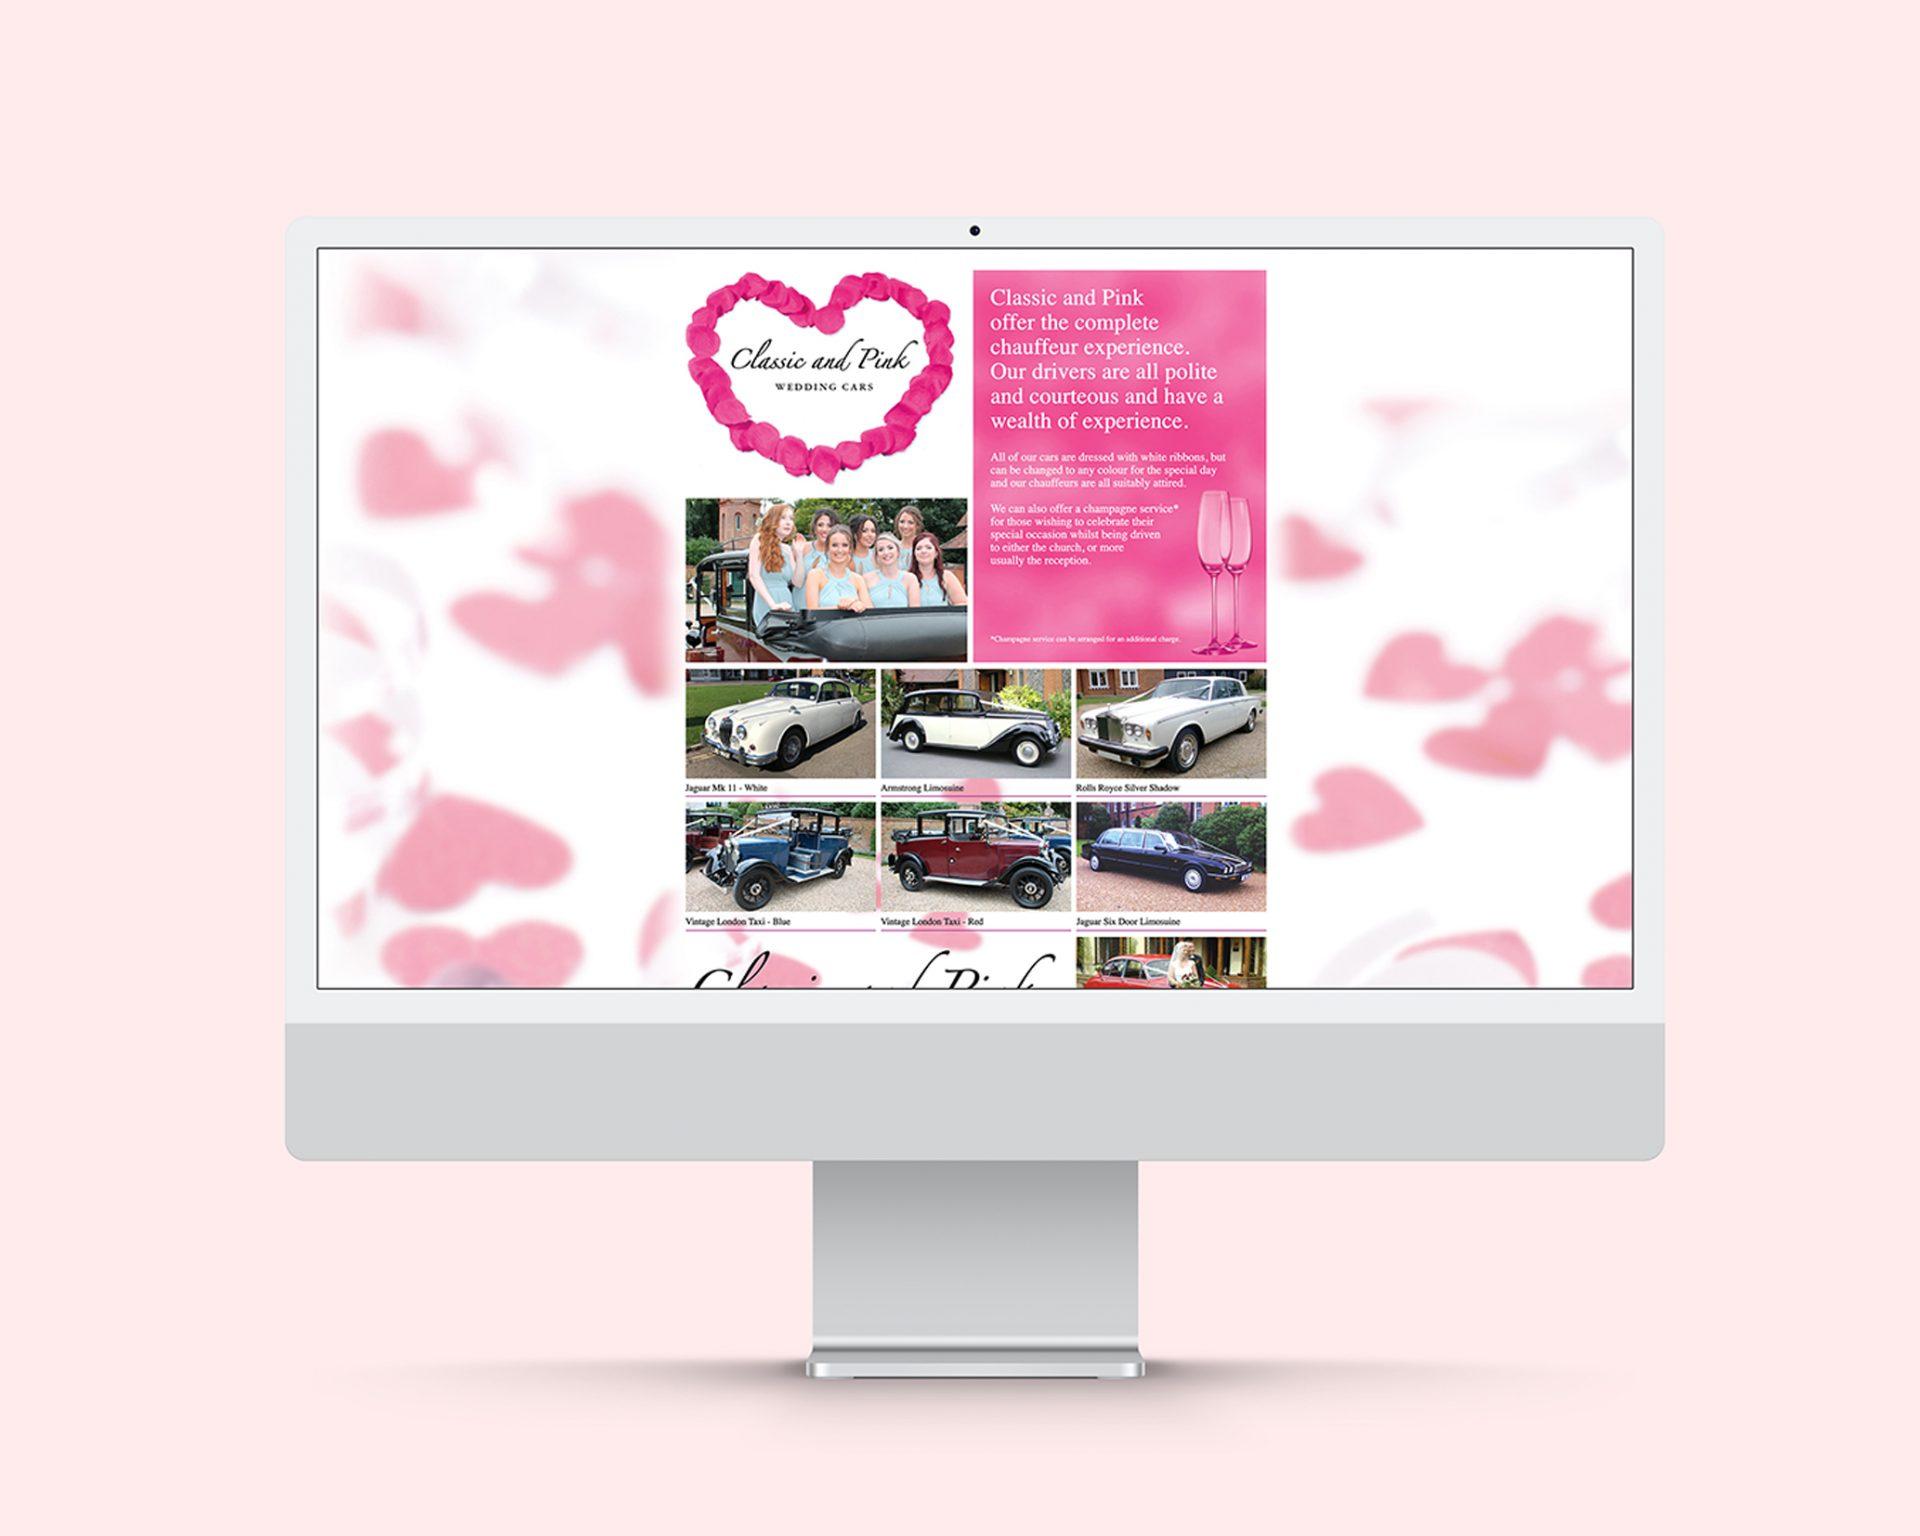 Wedding Car Website Design & Branding